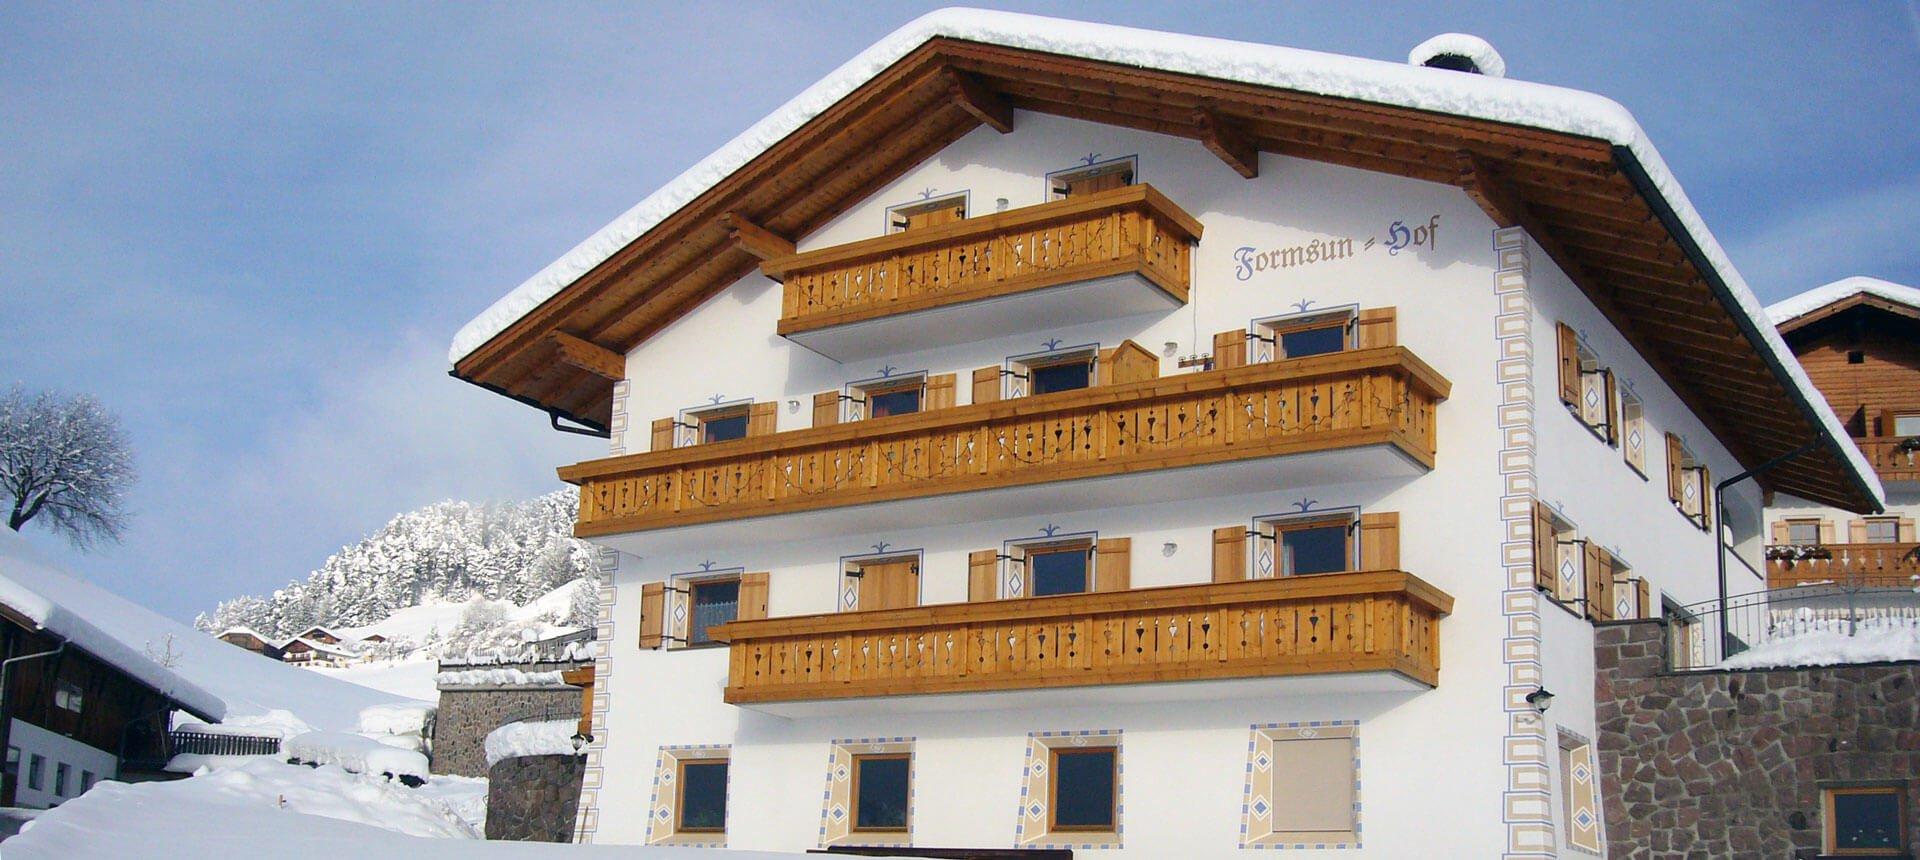 skiurlaub-kastelruth-dolomiten